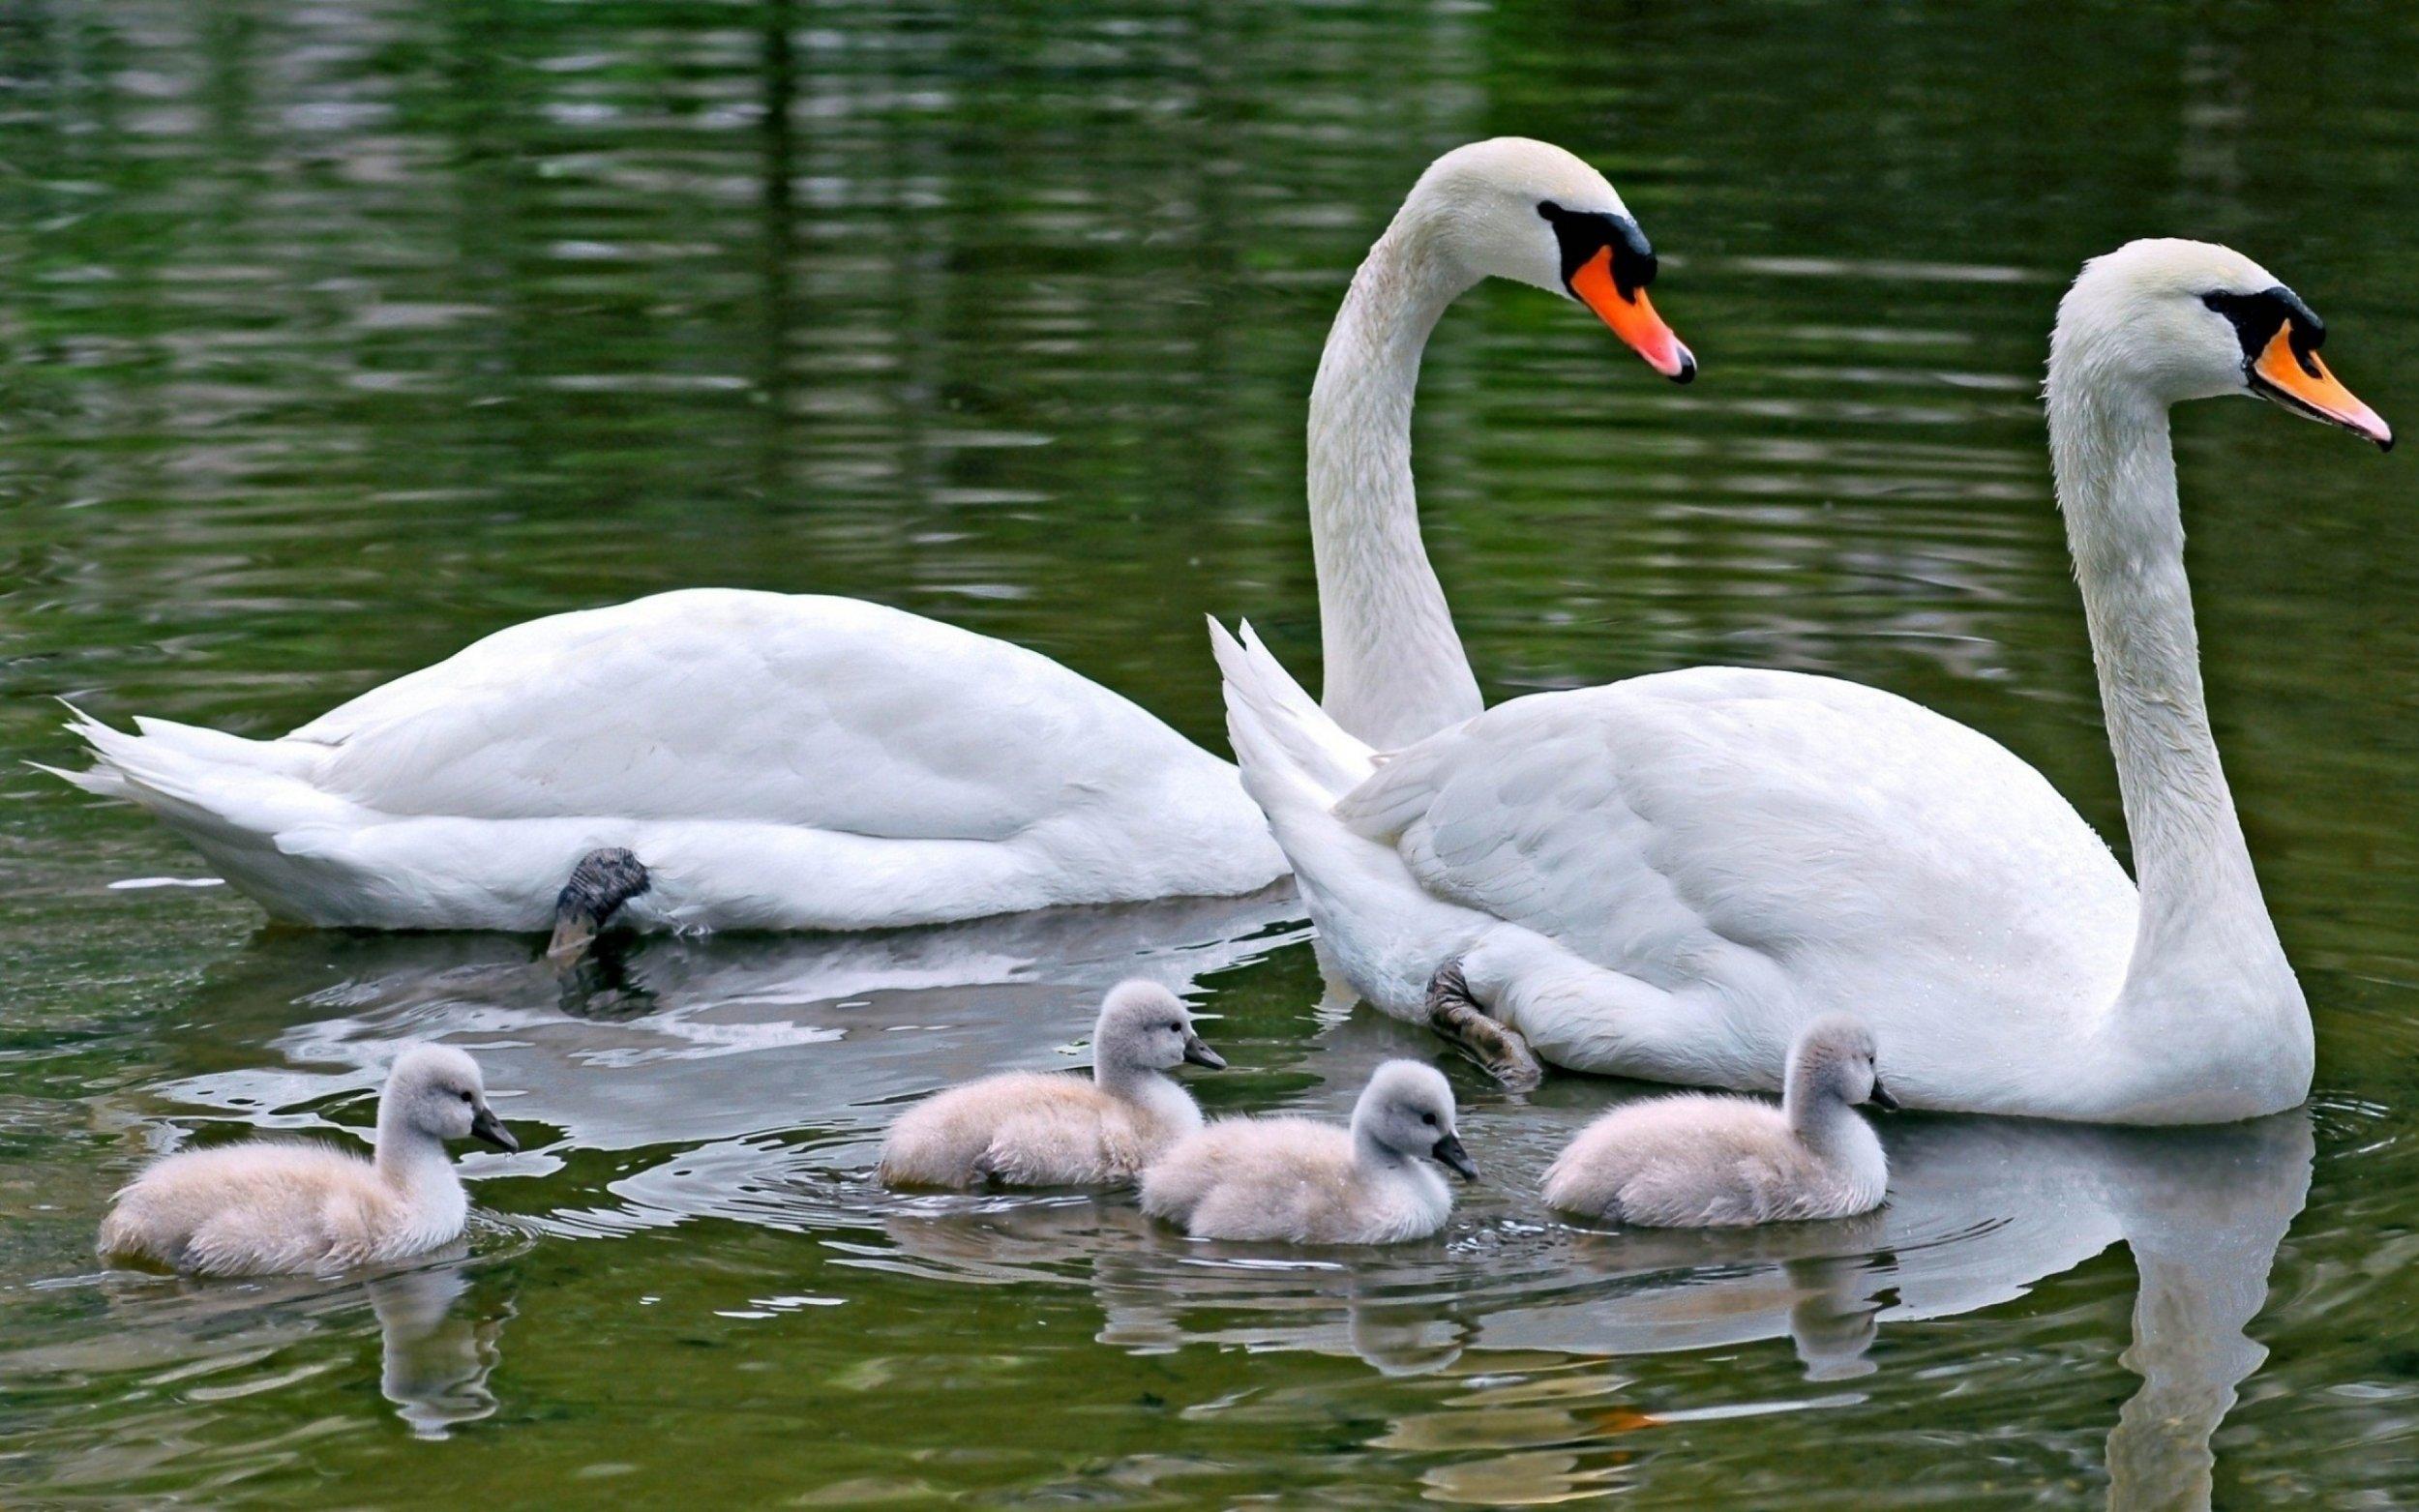 swans_swim_bird_young_89869_3840x2400.jpg